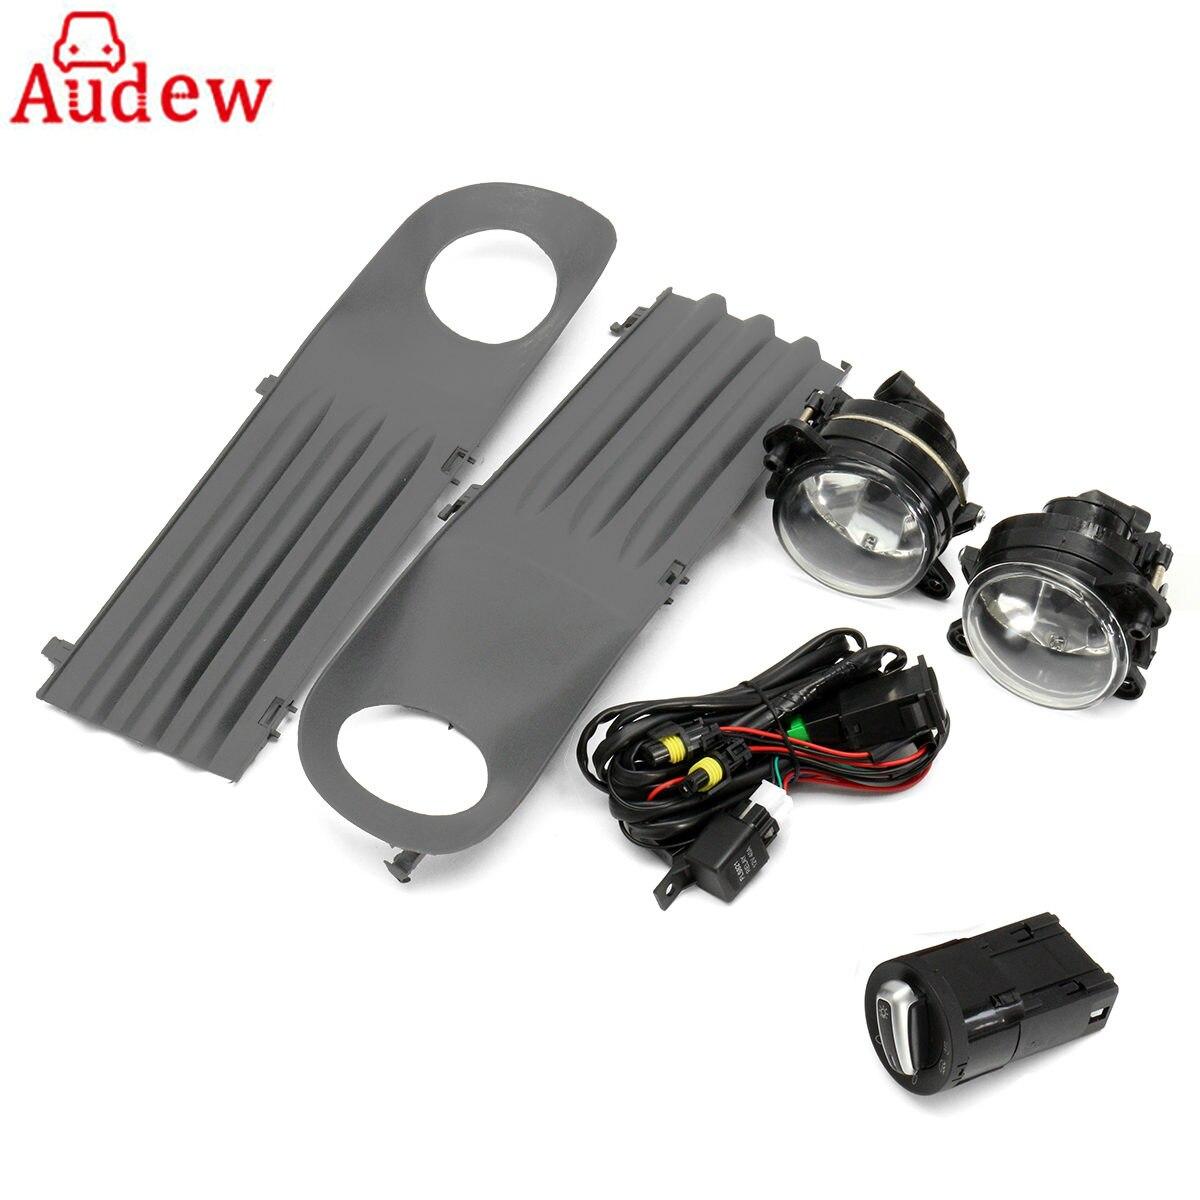 цена на Amber Car Front Foglight Grille Kit Set w/ Wiring Headlight Switch H11 Fog Light Bulb For VW T5 TRANSPORTER 2003-2010